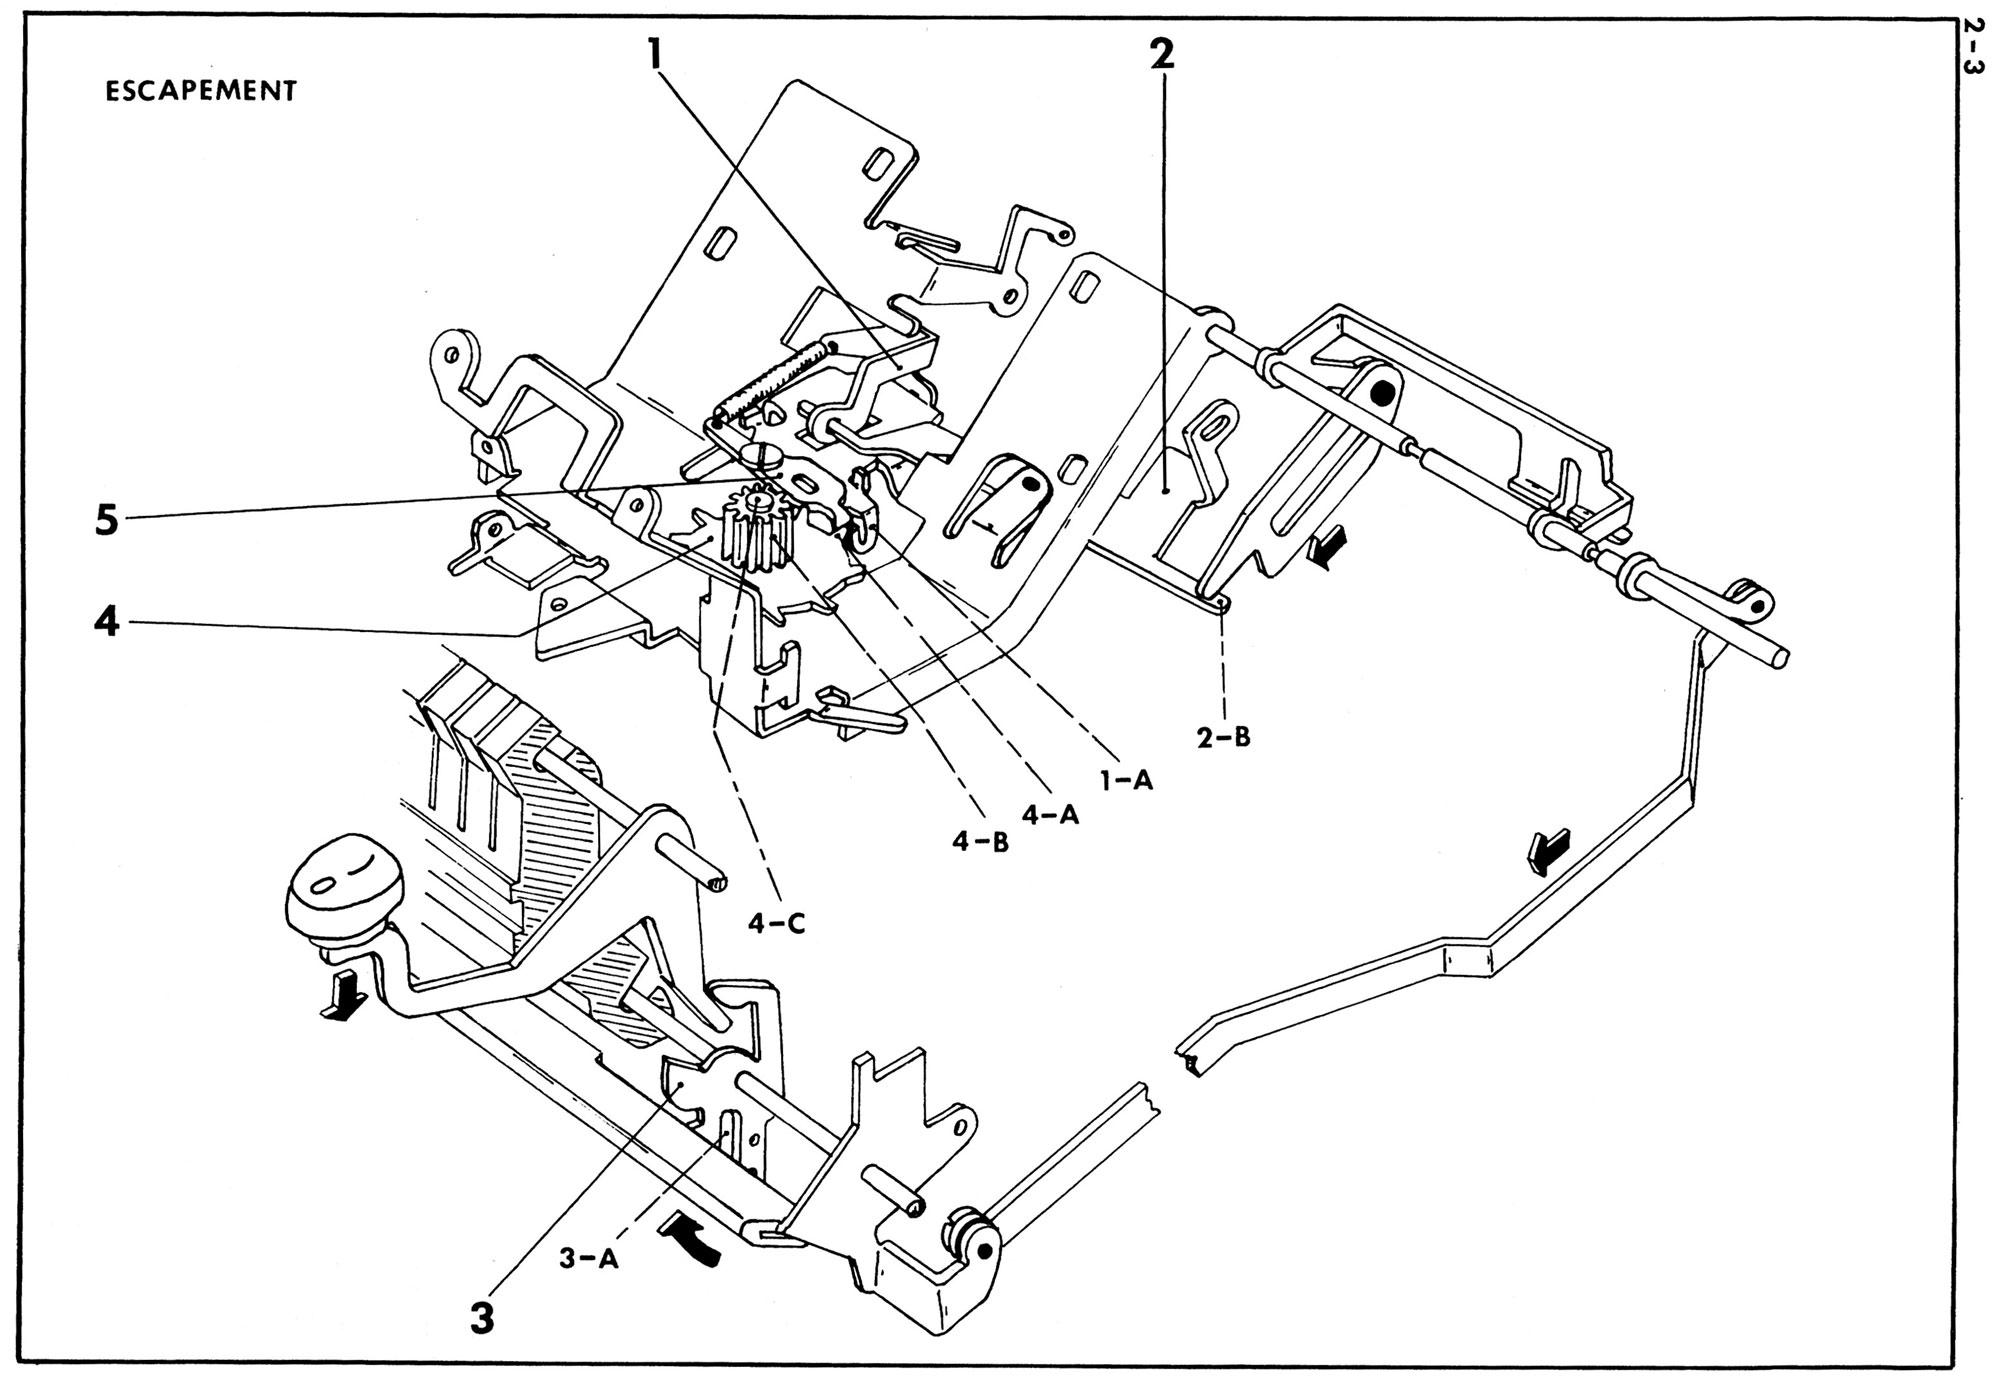 Adjusting Escapement Trip on Smith-Corona Skyriter